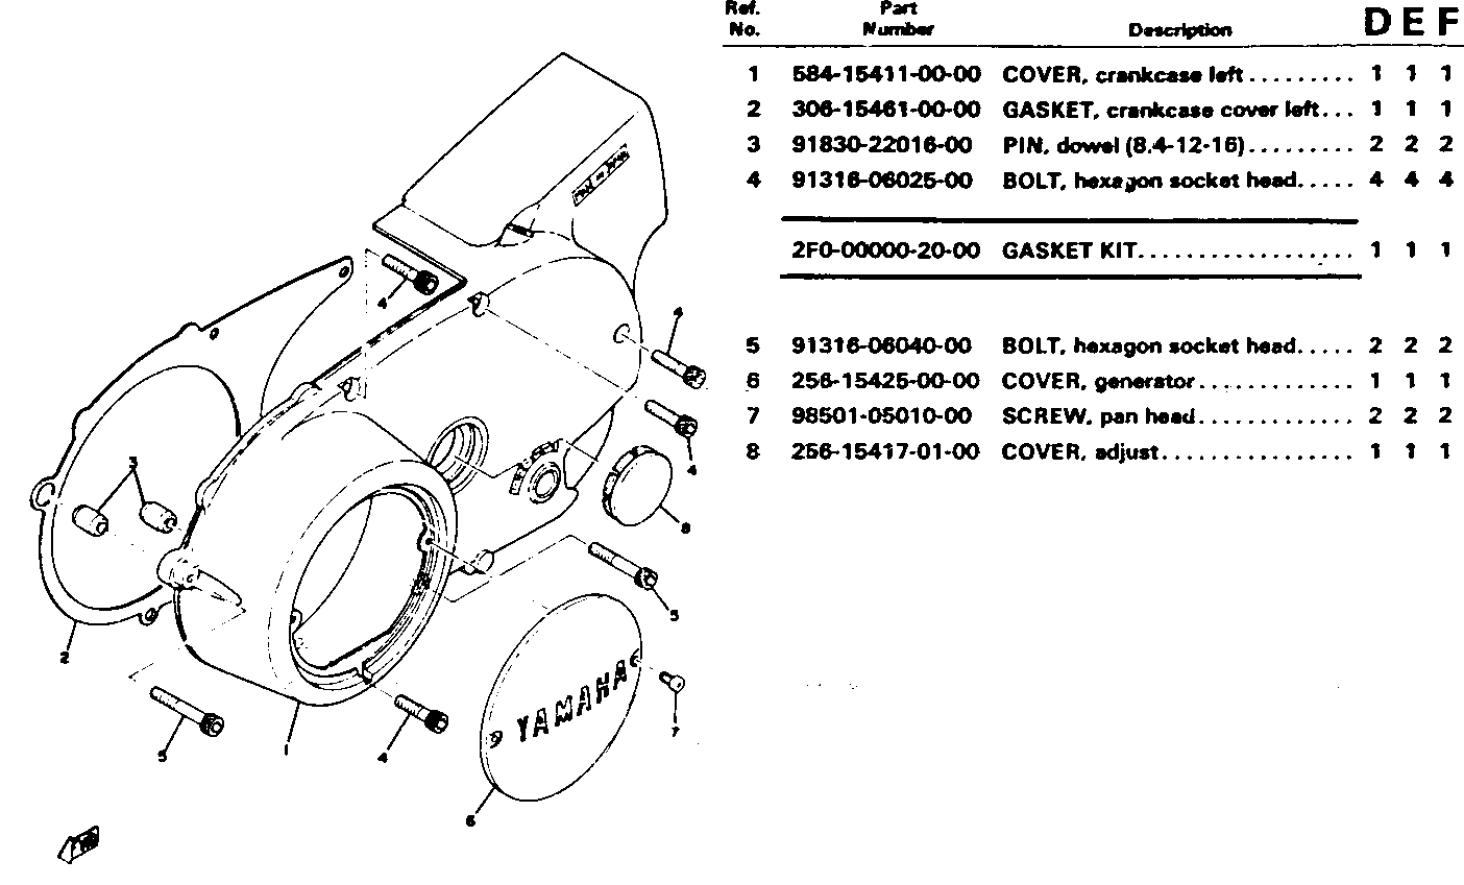 left hand engine covers yamaha xs650 forum rh xs650 com Fire Harley Ignition Wire Diagram for Duo Suzuki LT80 Carburetor Diagram